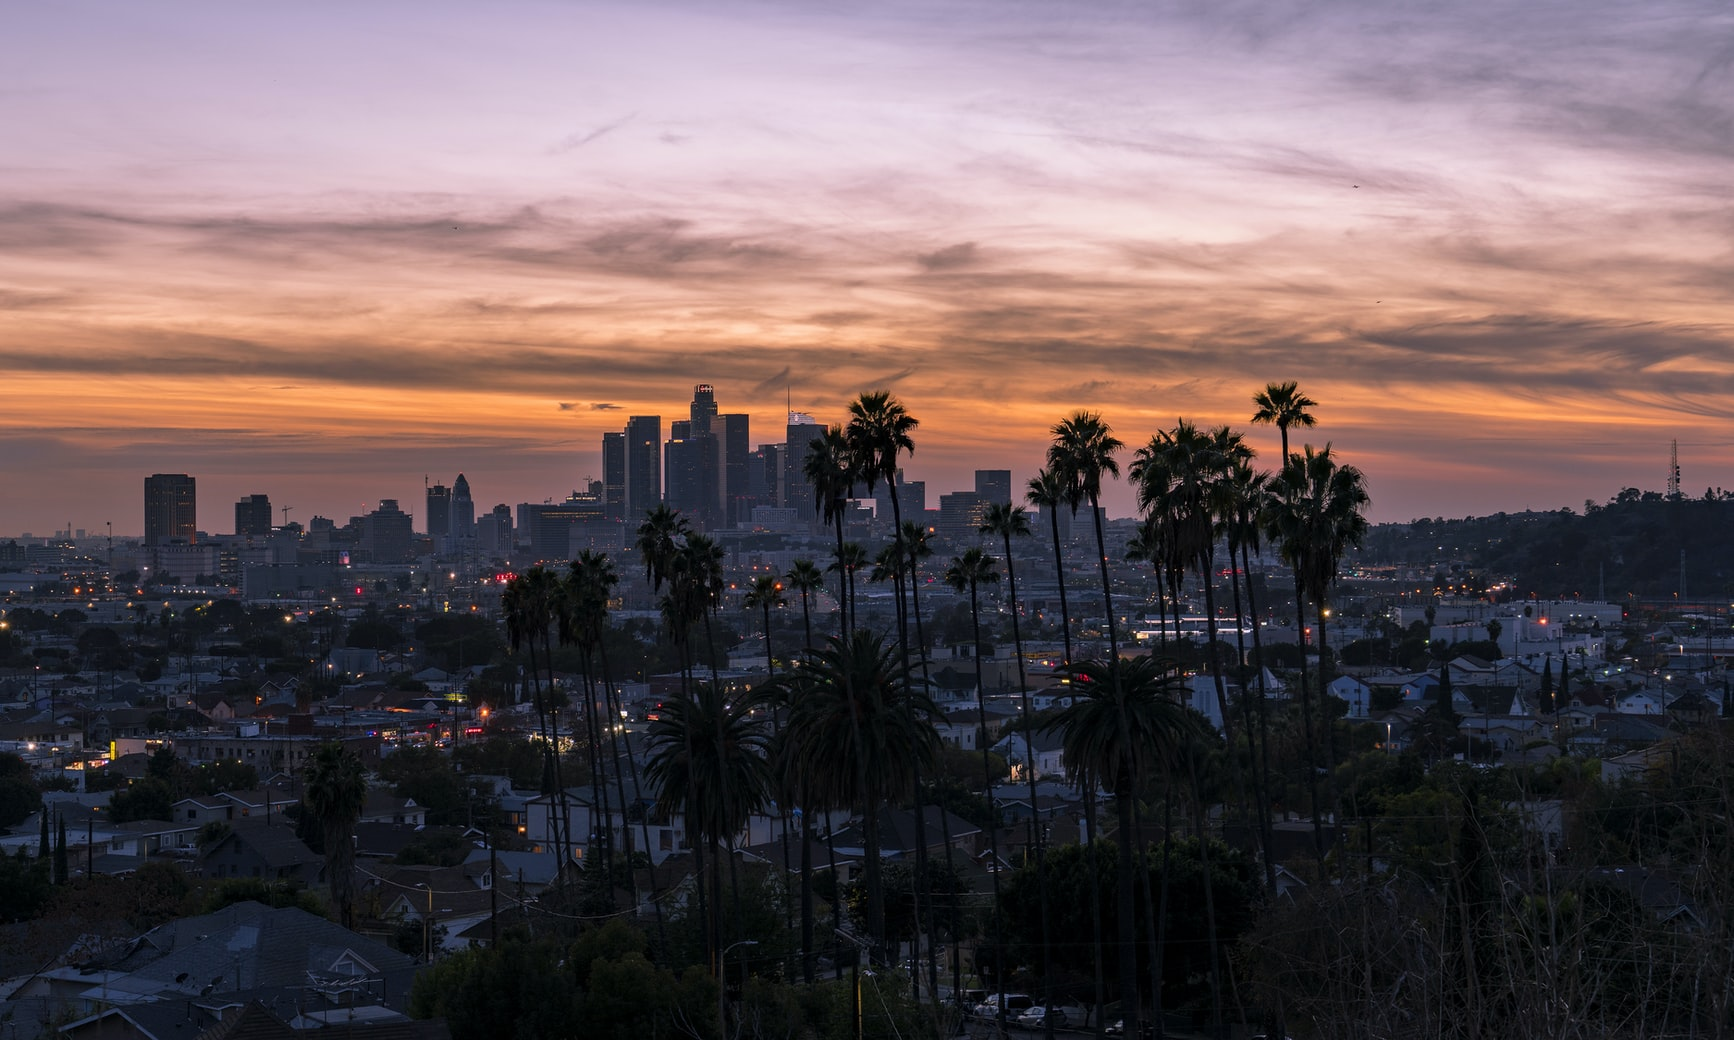 Top 220+ Tech Companies In California In 2021